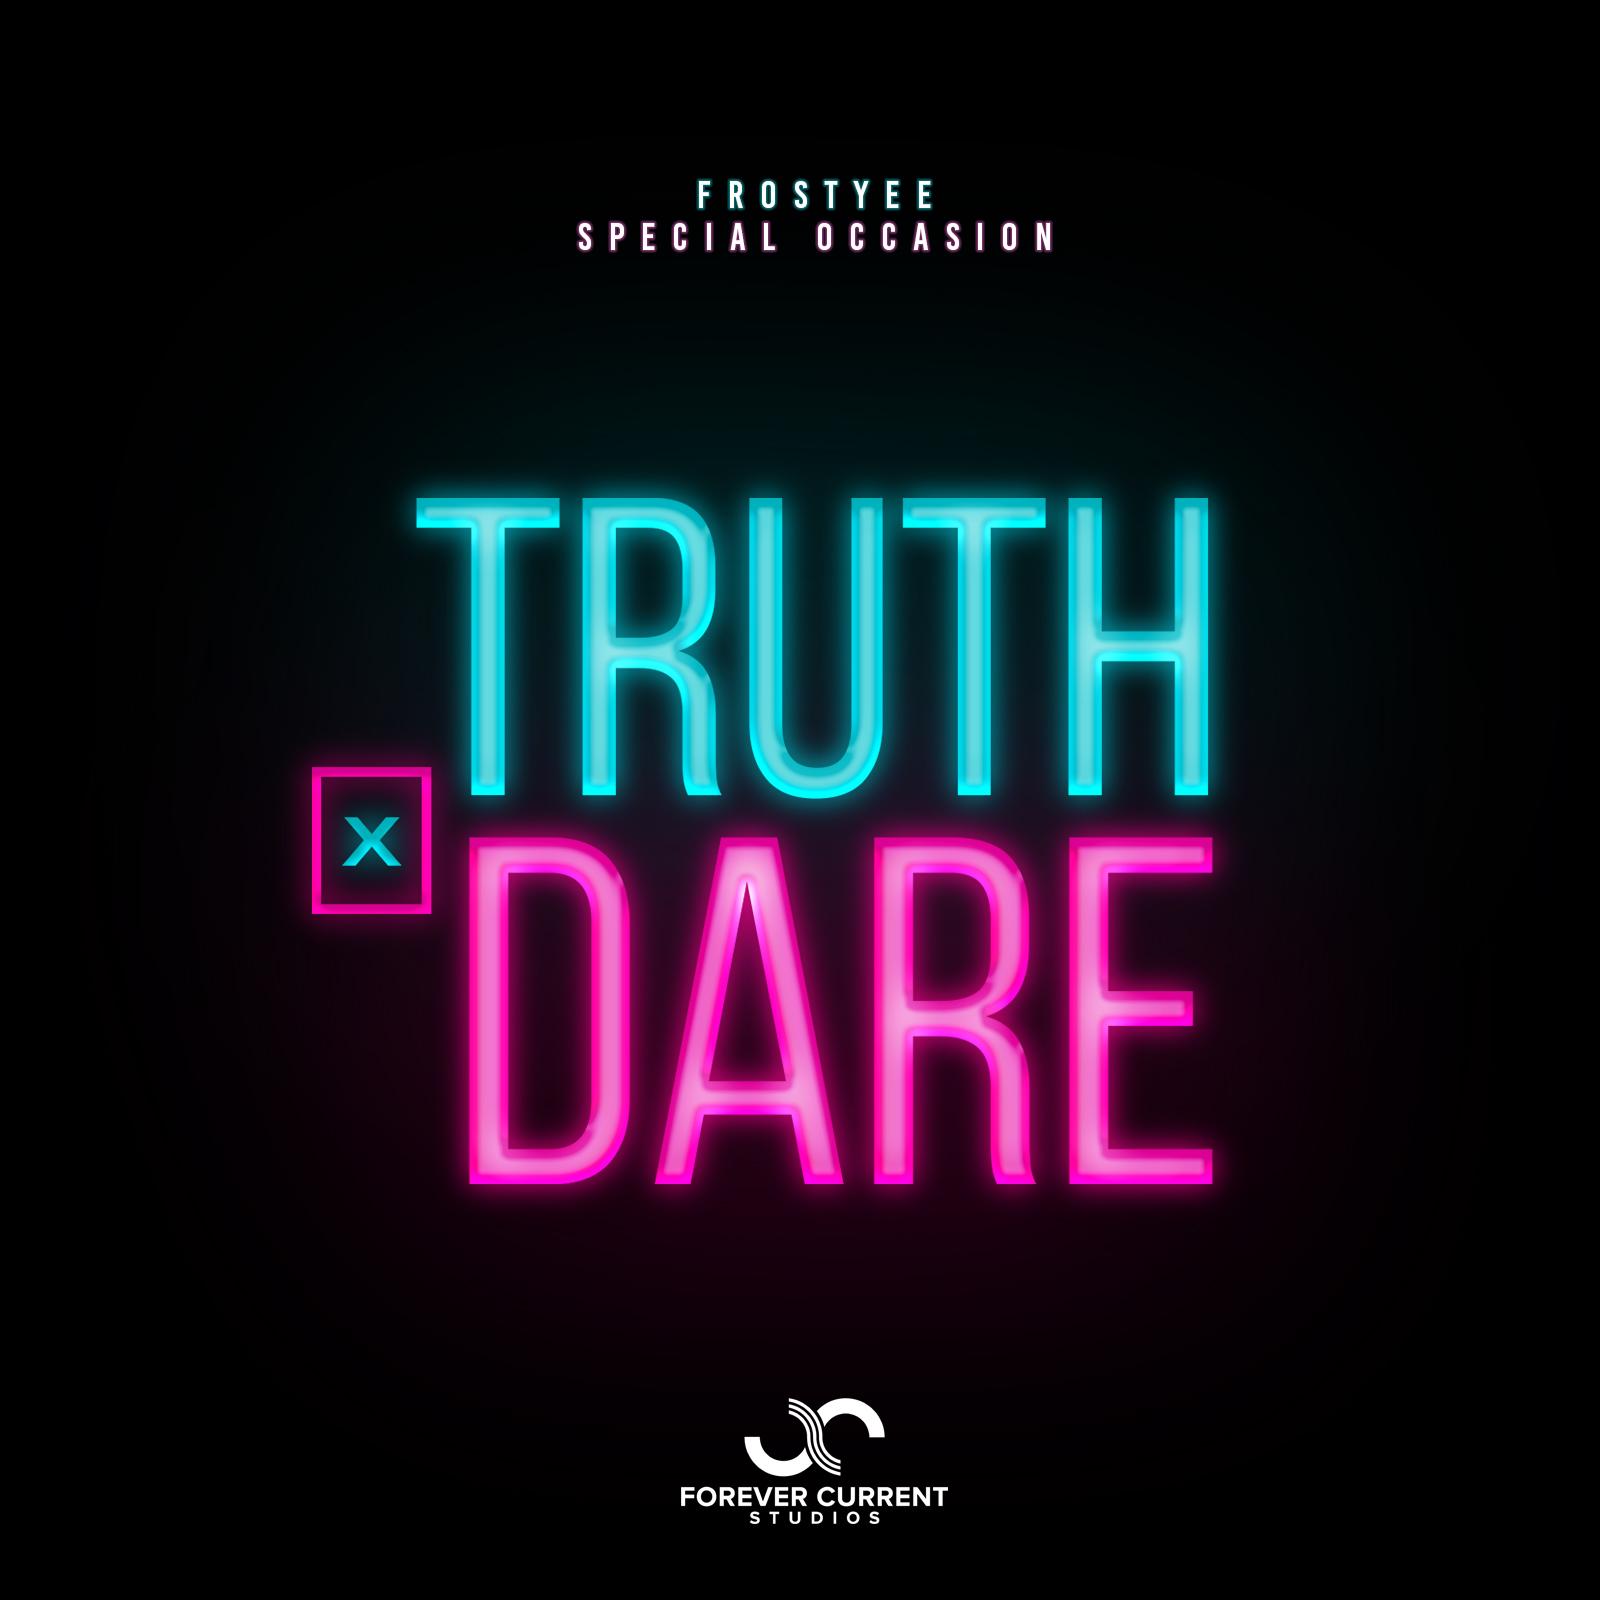 Truth x Dare-FS.jpg